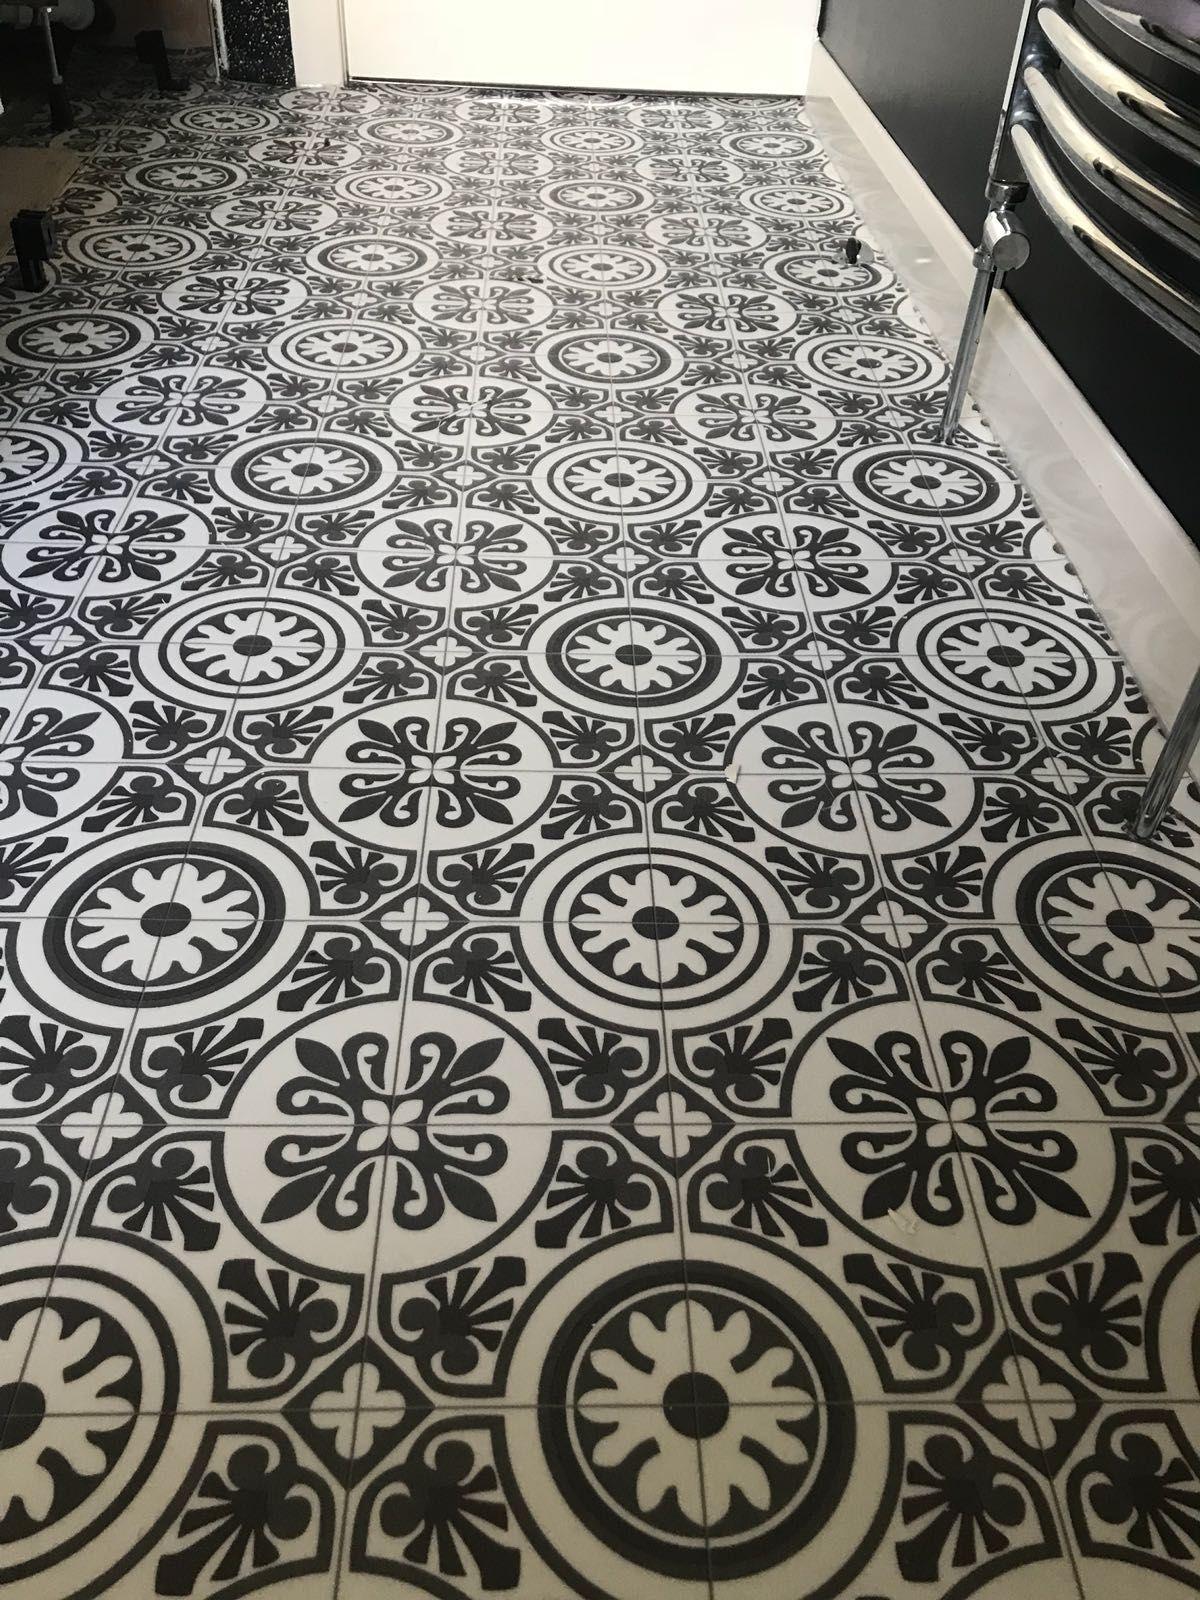 Unique Traditional Look Tile Effect Vinyl Flooring Pictured